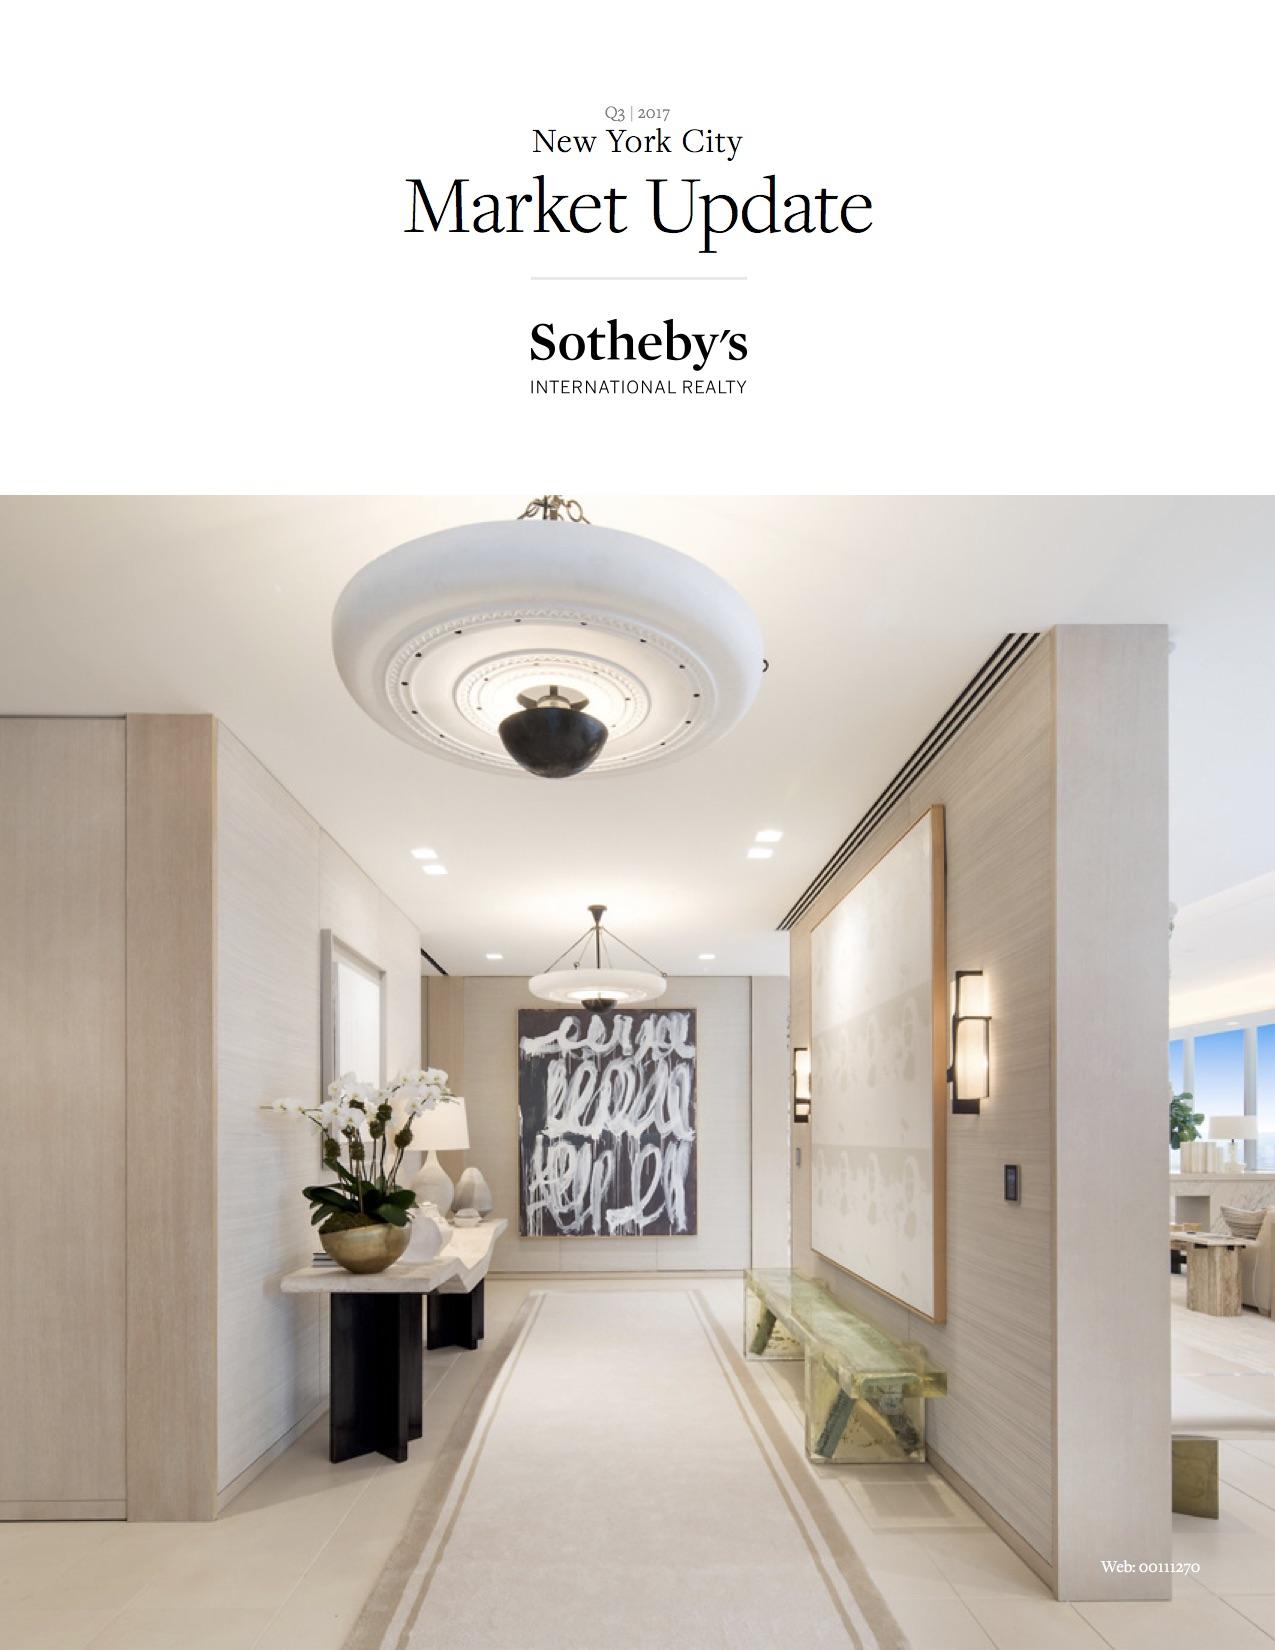 SIR New York City Real Estate Market Report_1.jpg